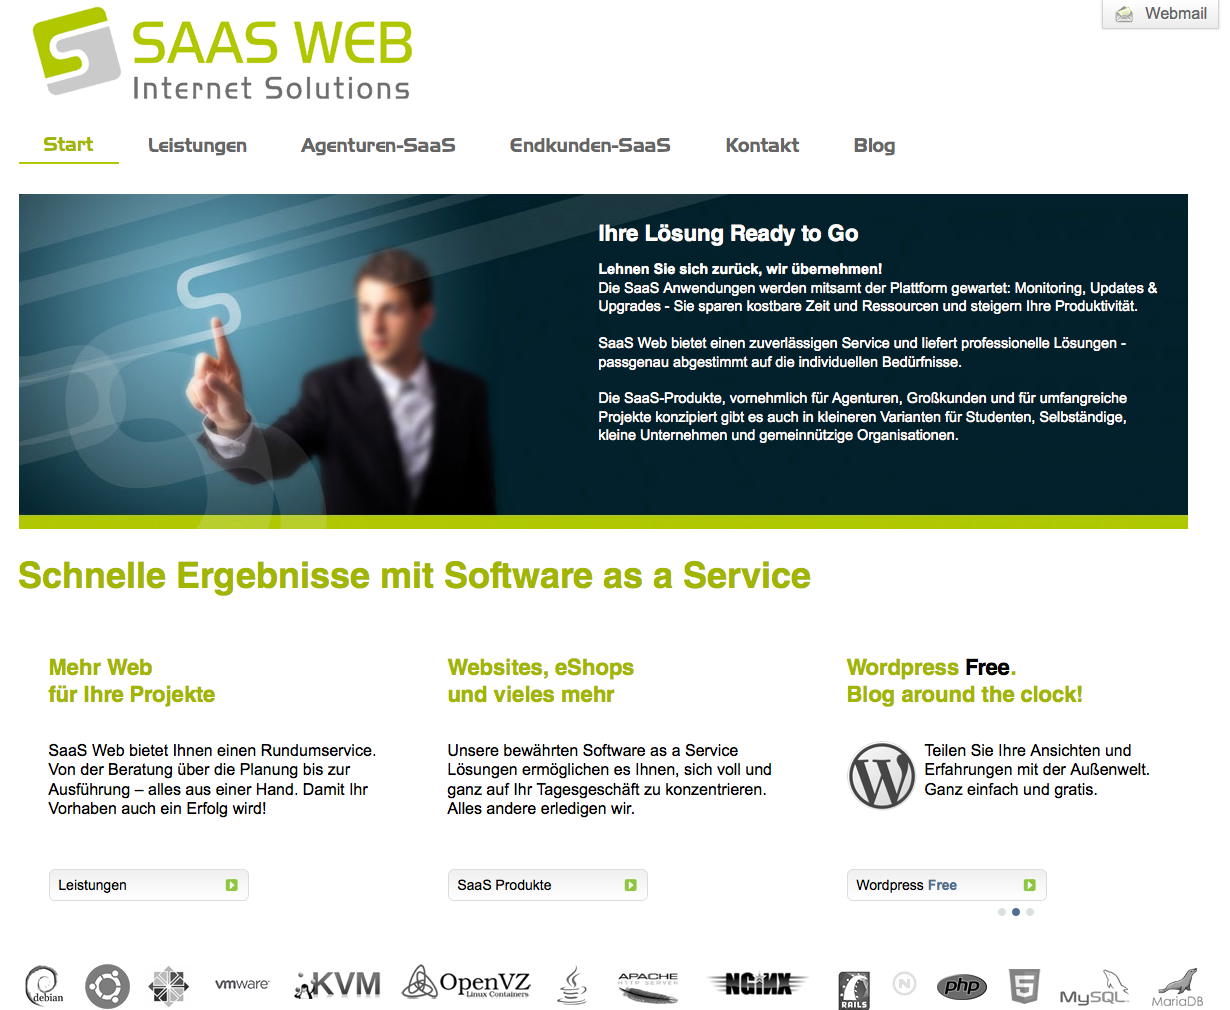 saasweb-homepage